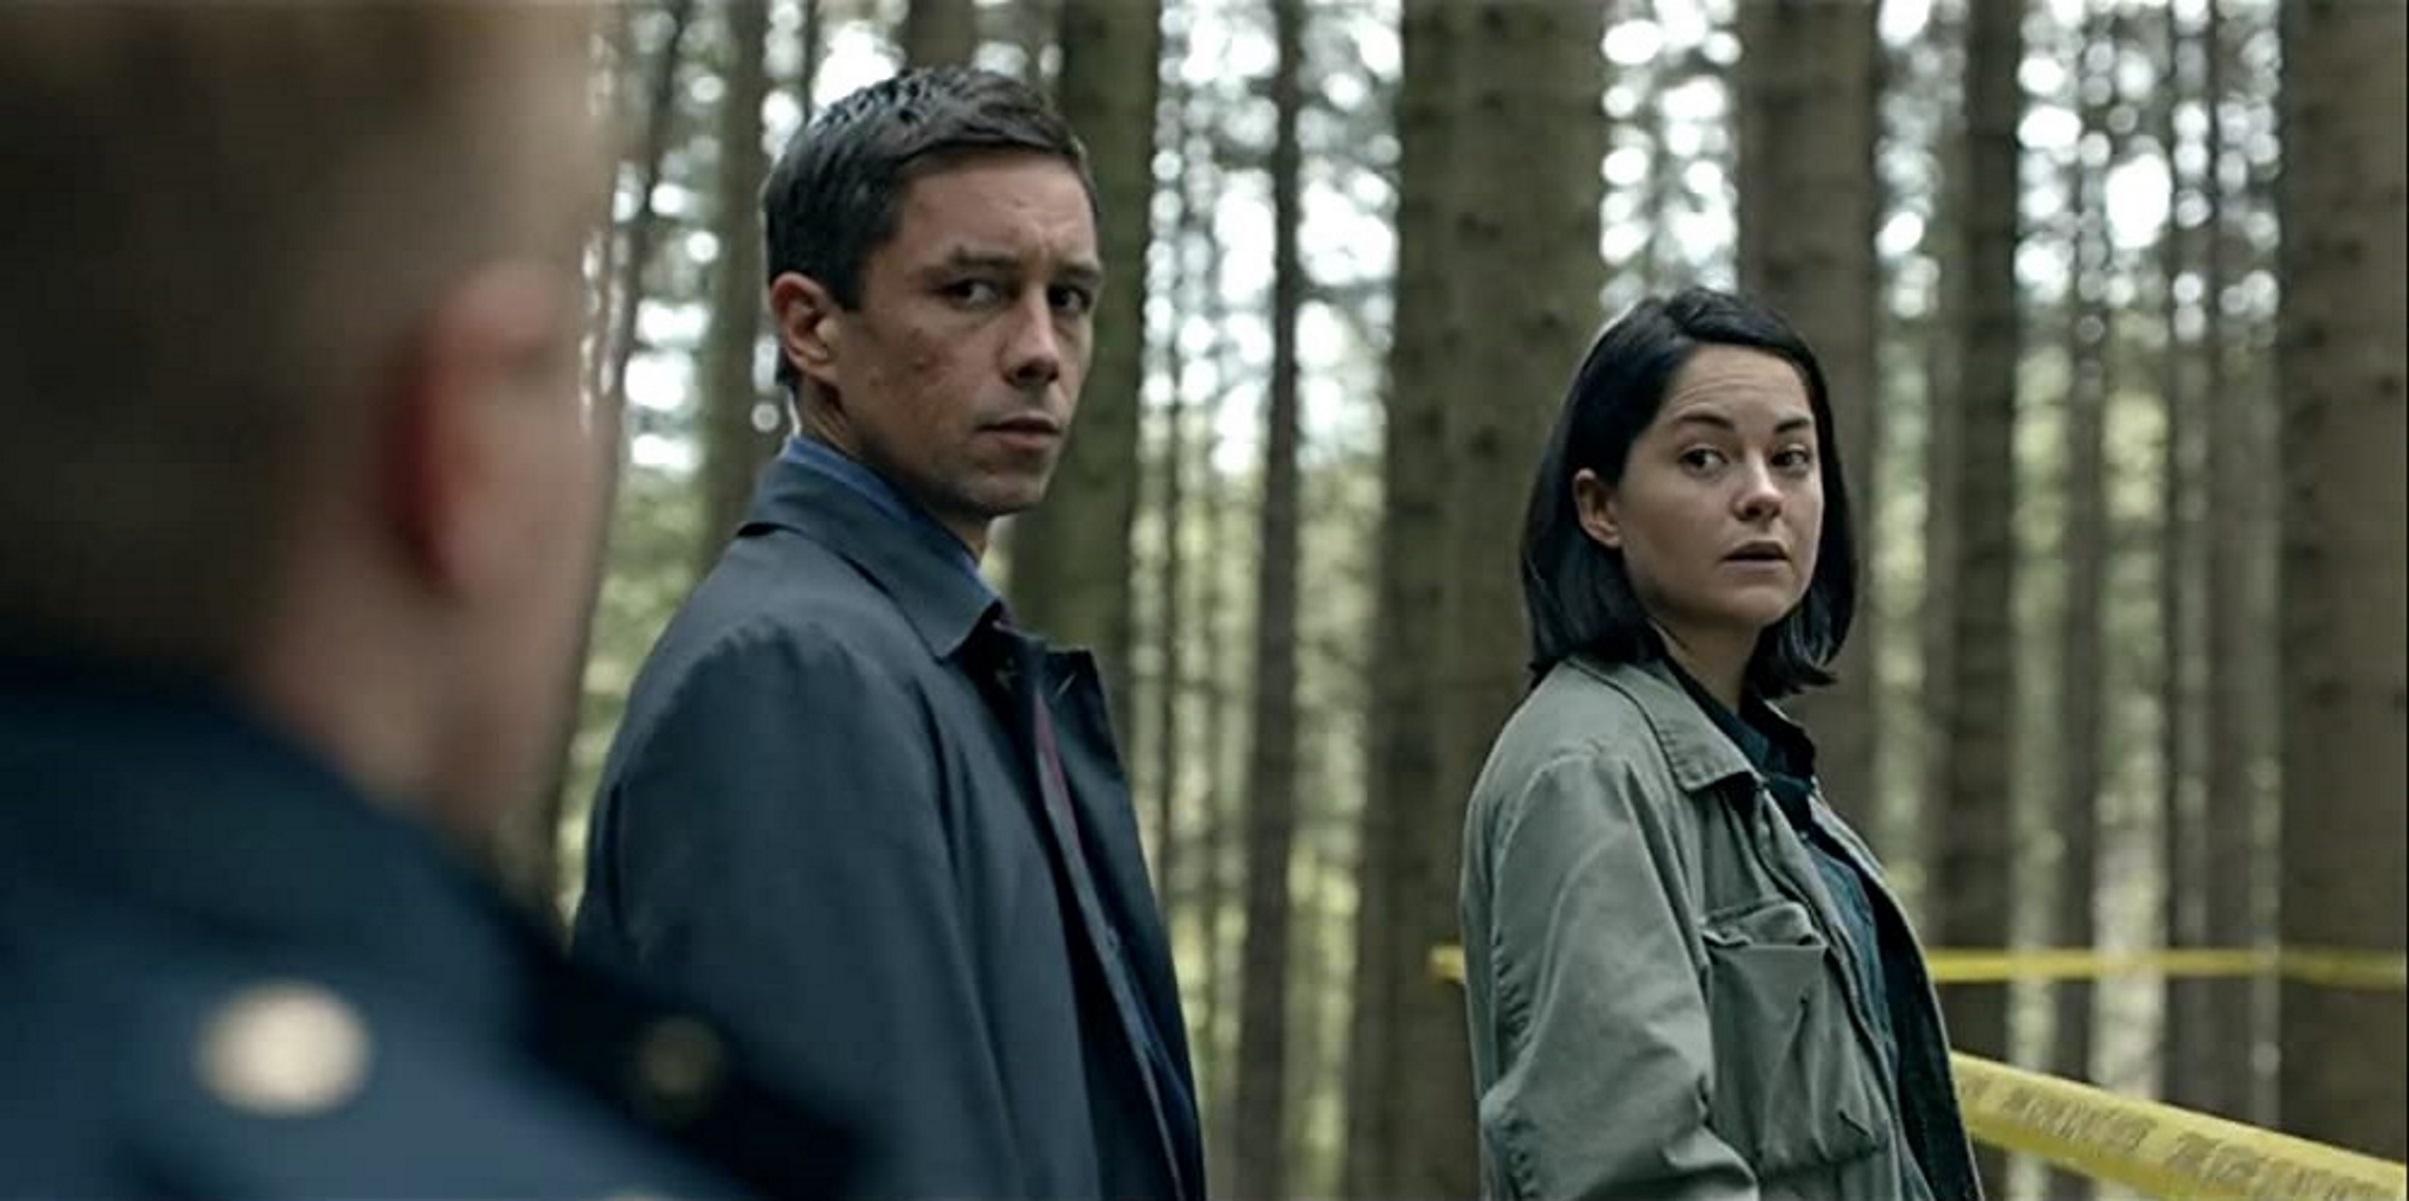 Vodafone TV: Οκτώβριος με πλούσιο περιεχόμενο από HBO, σινεμά και ντοκιμαντέρ